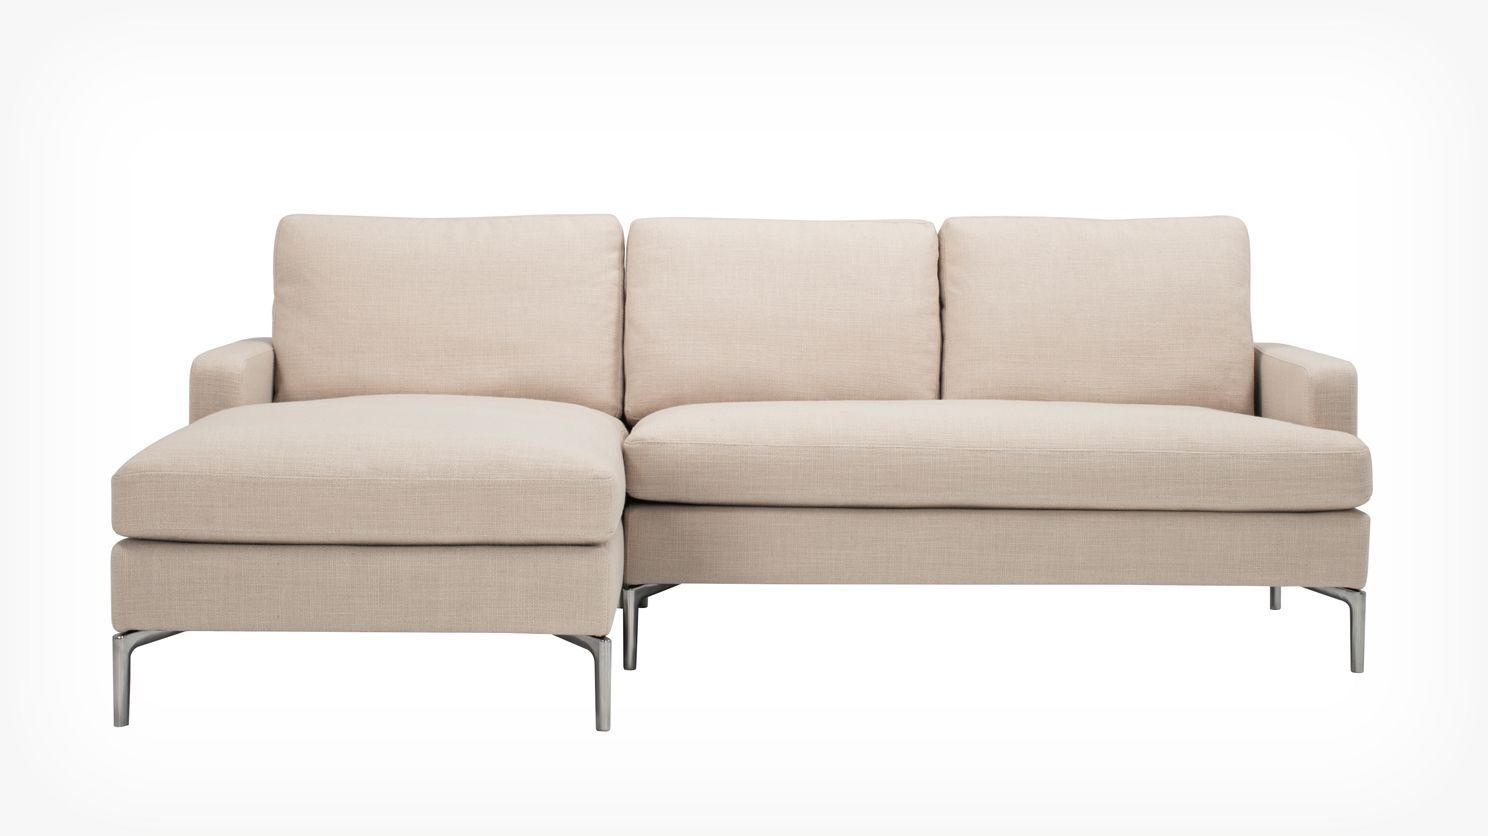 Sofa chaise ottoman 2 bte Ottomans